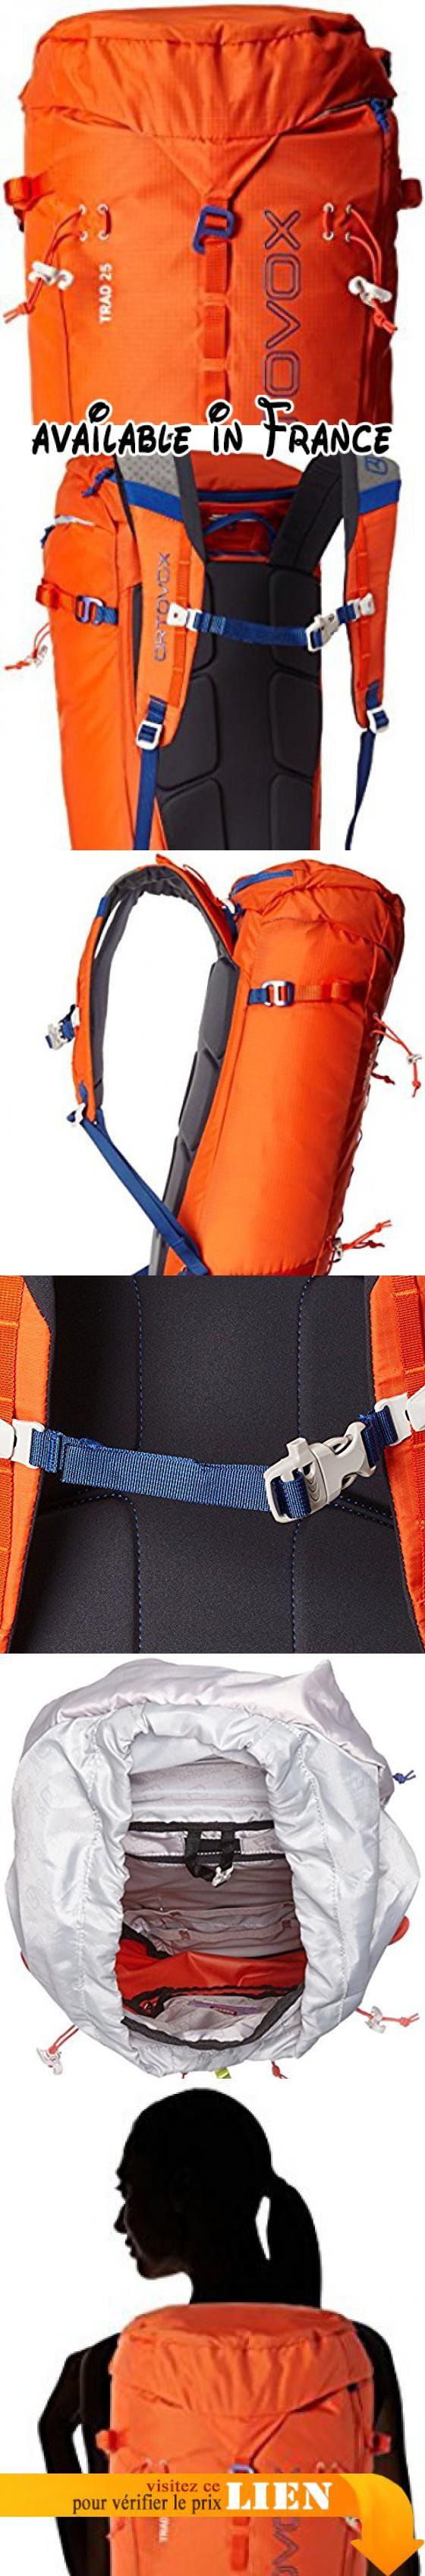 B01BMTPBFG : Ortovox Trad 25 Hiking Backpack. Back: Regular. Size: 25l. Weight: 750g